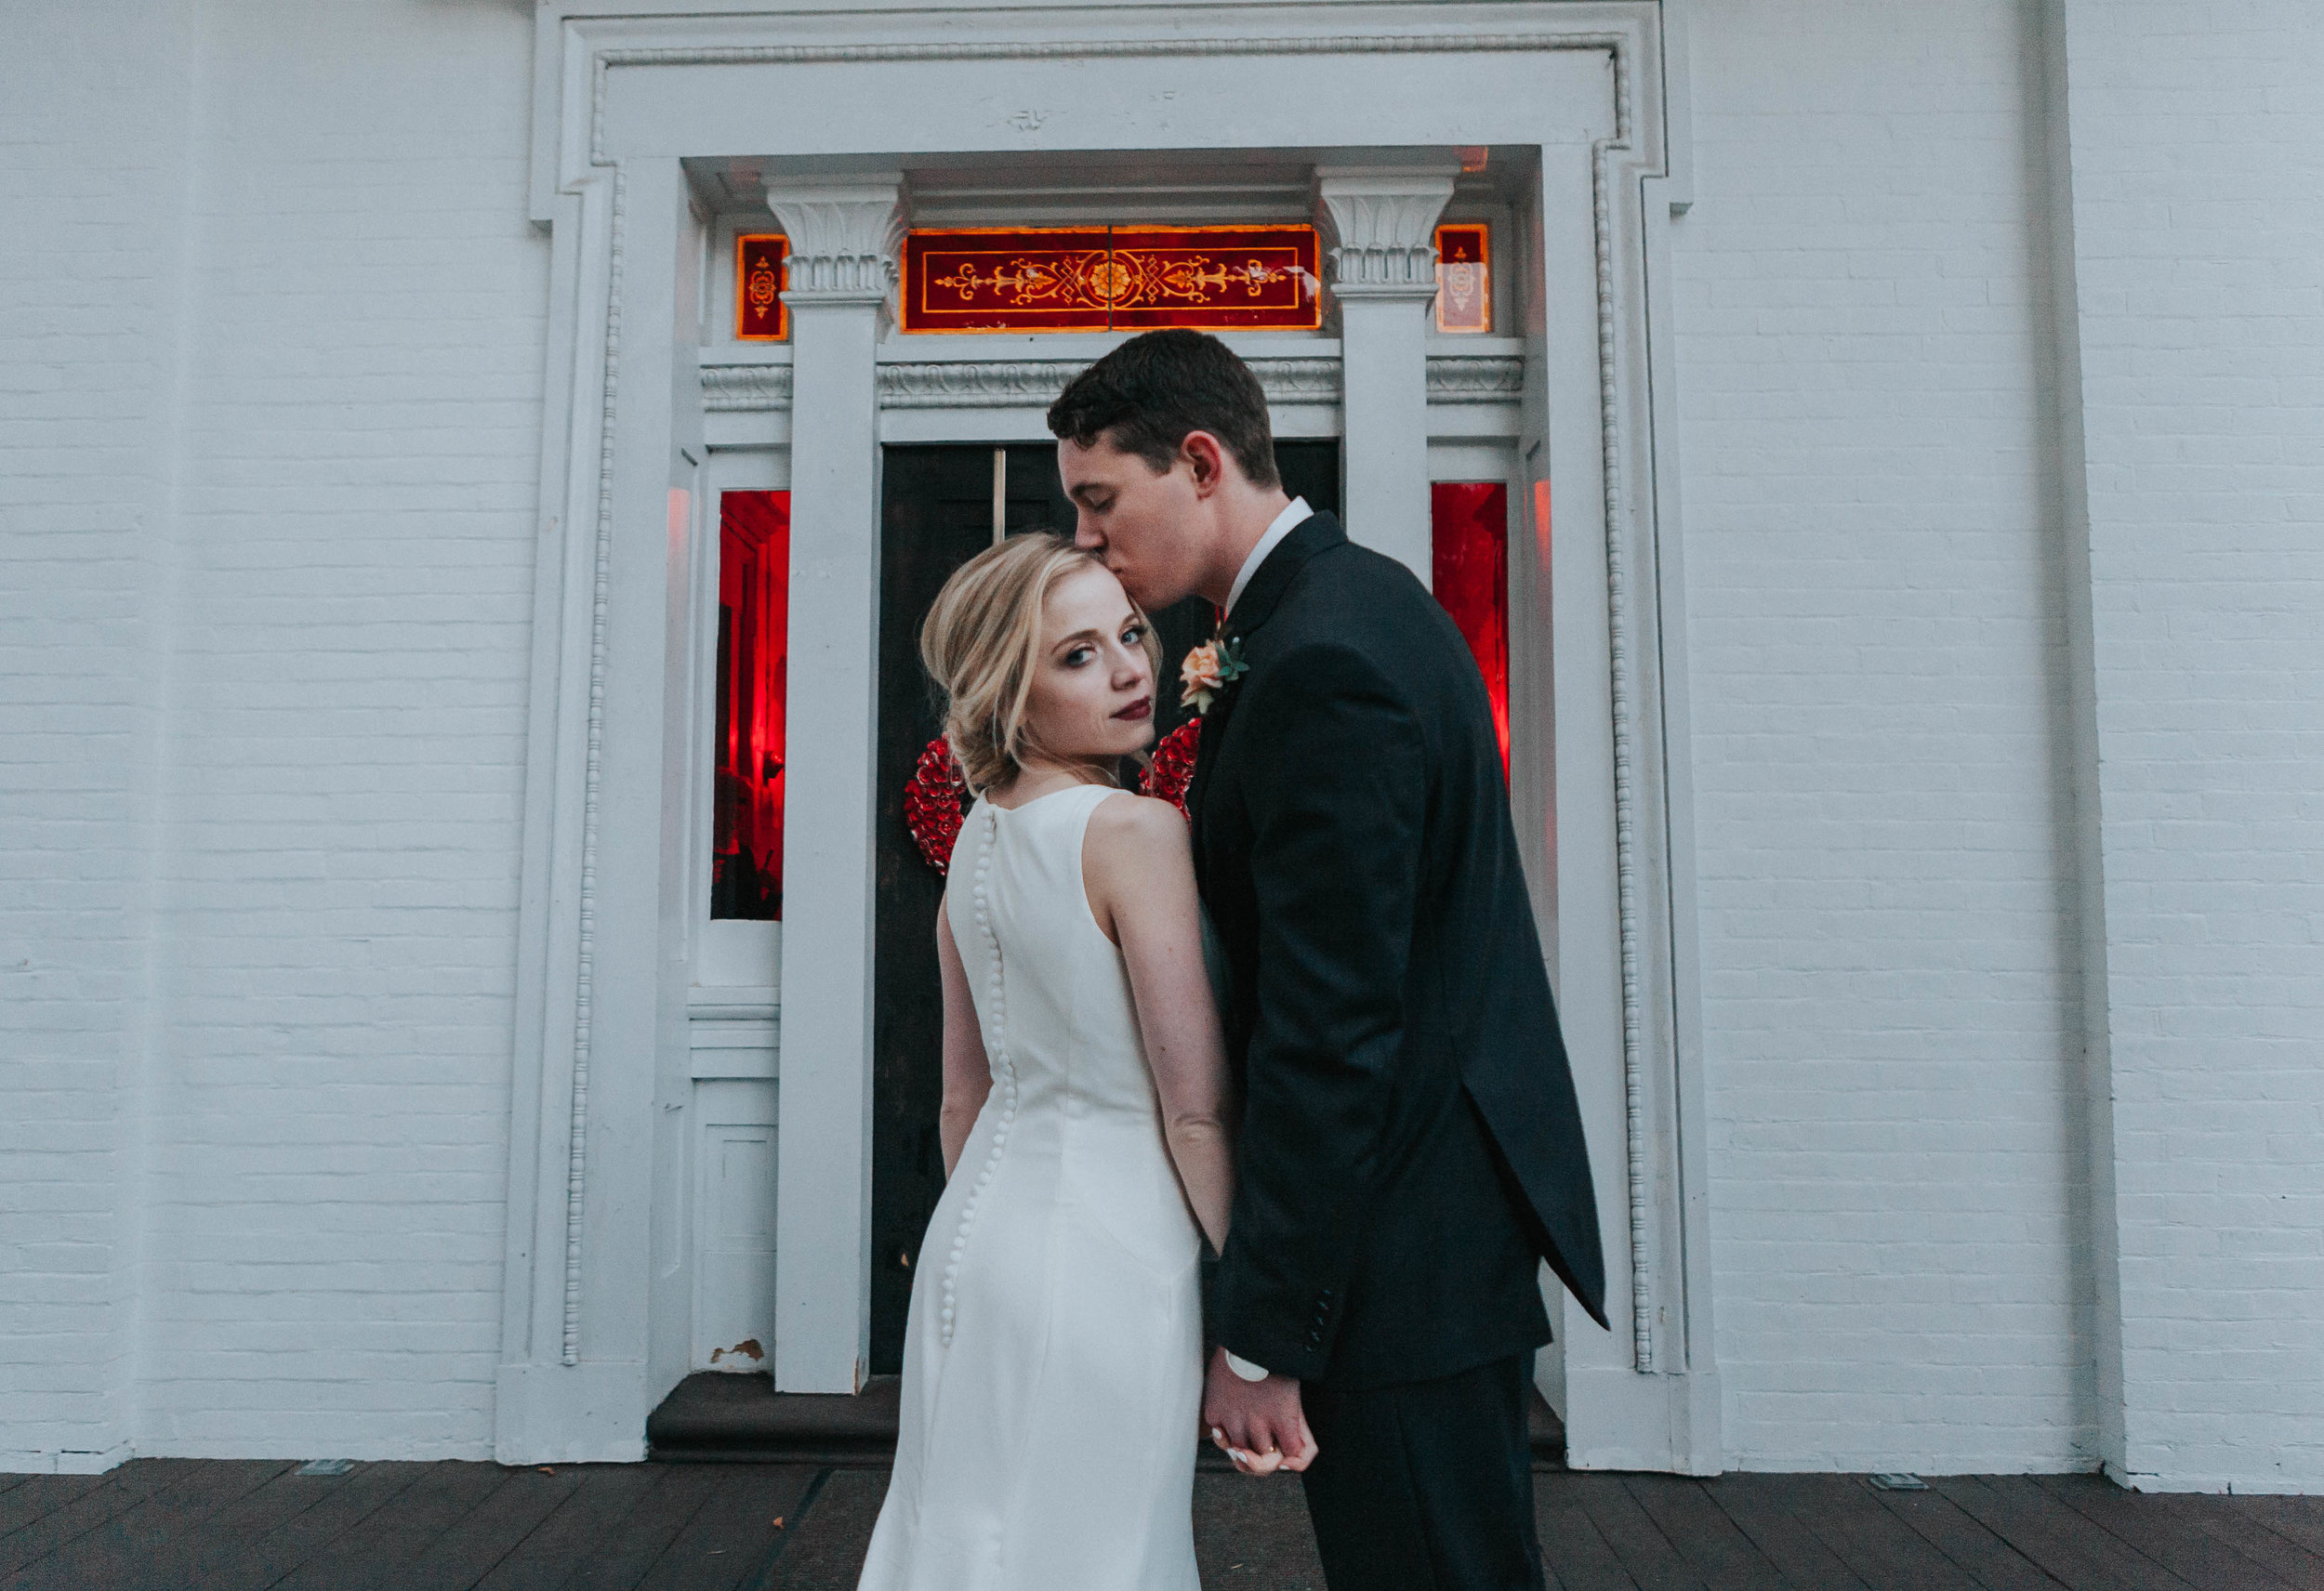 Charis_Lauren_Romantic_Wedding_Photographer_Nashville_0100.jpg